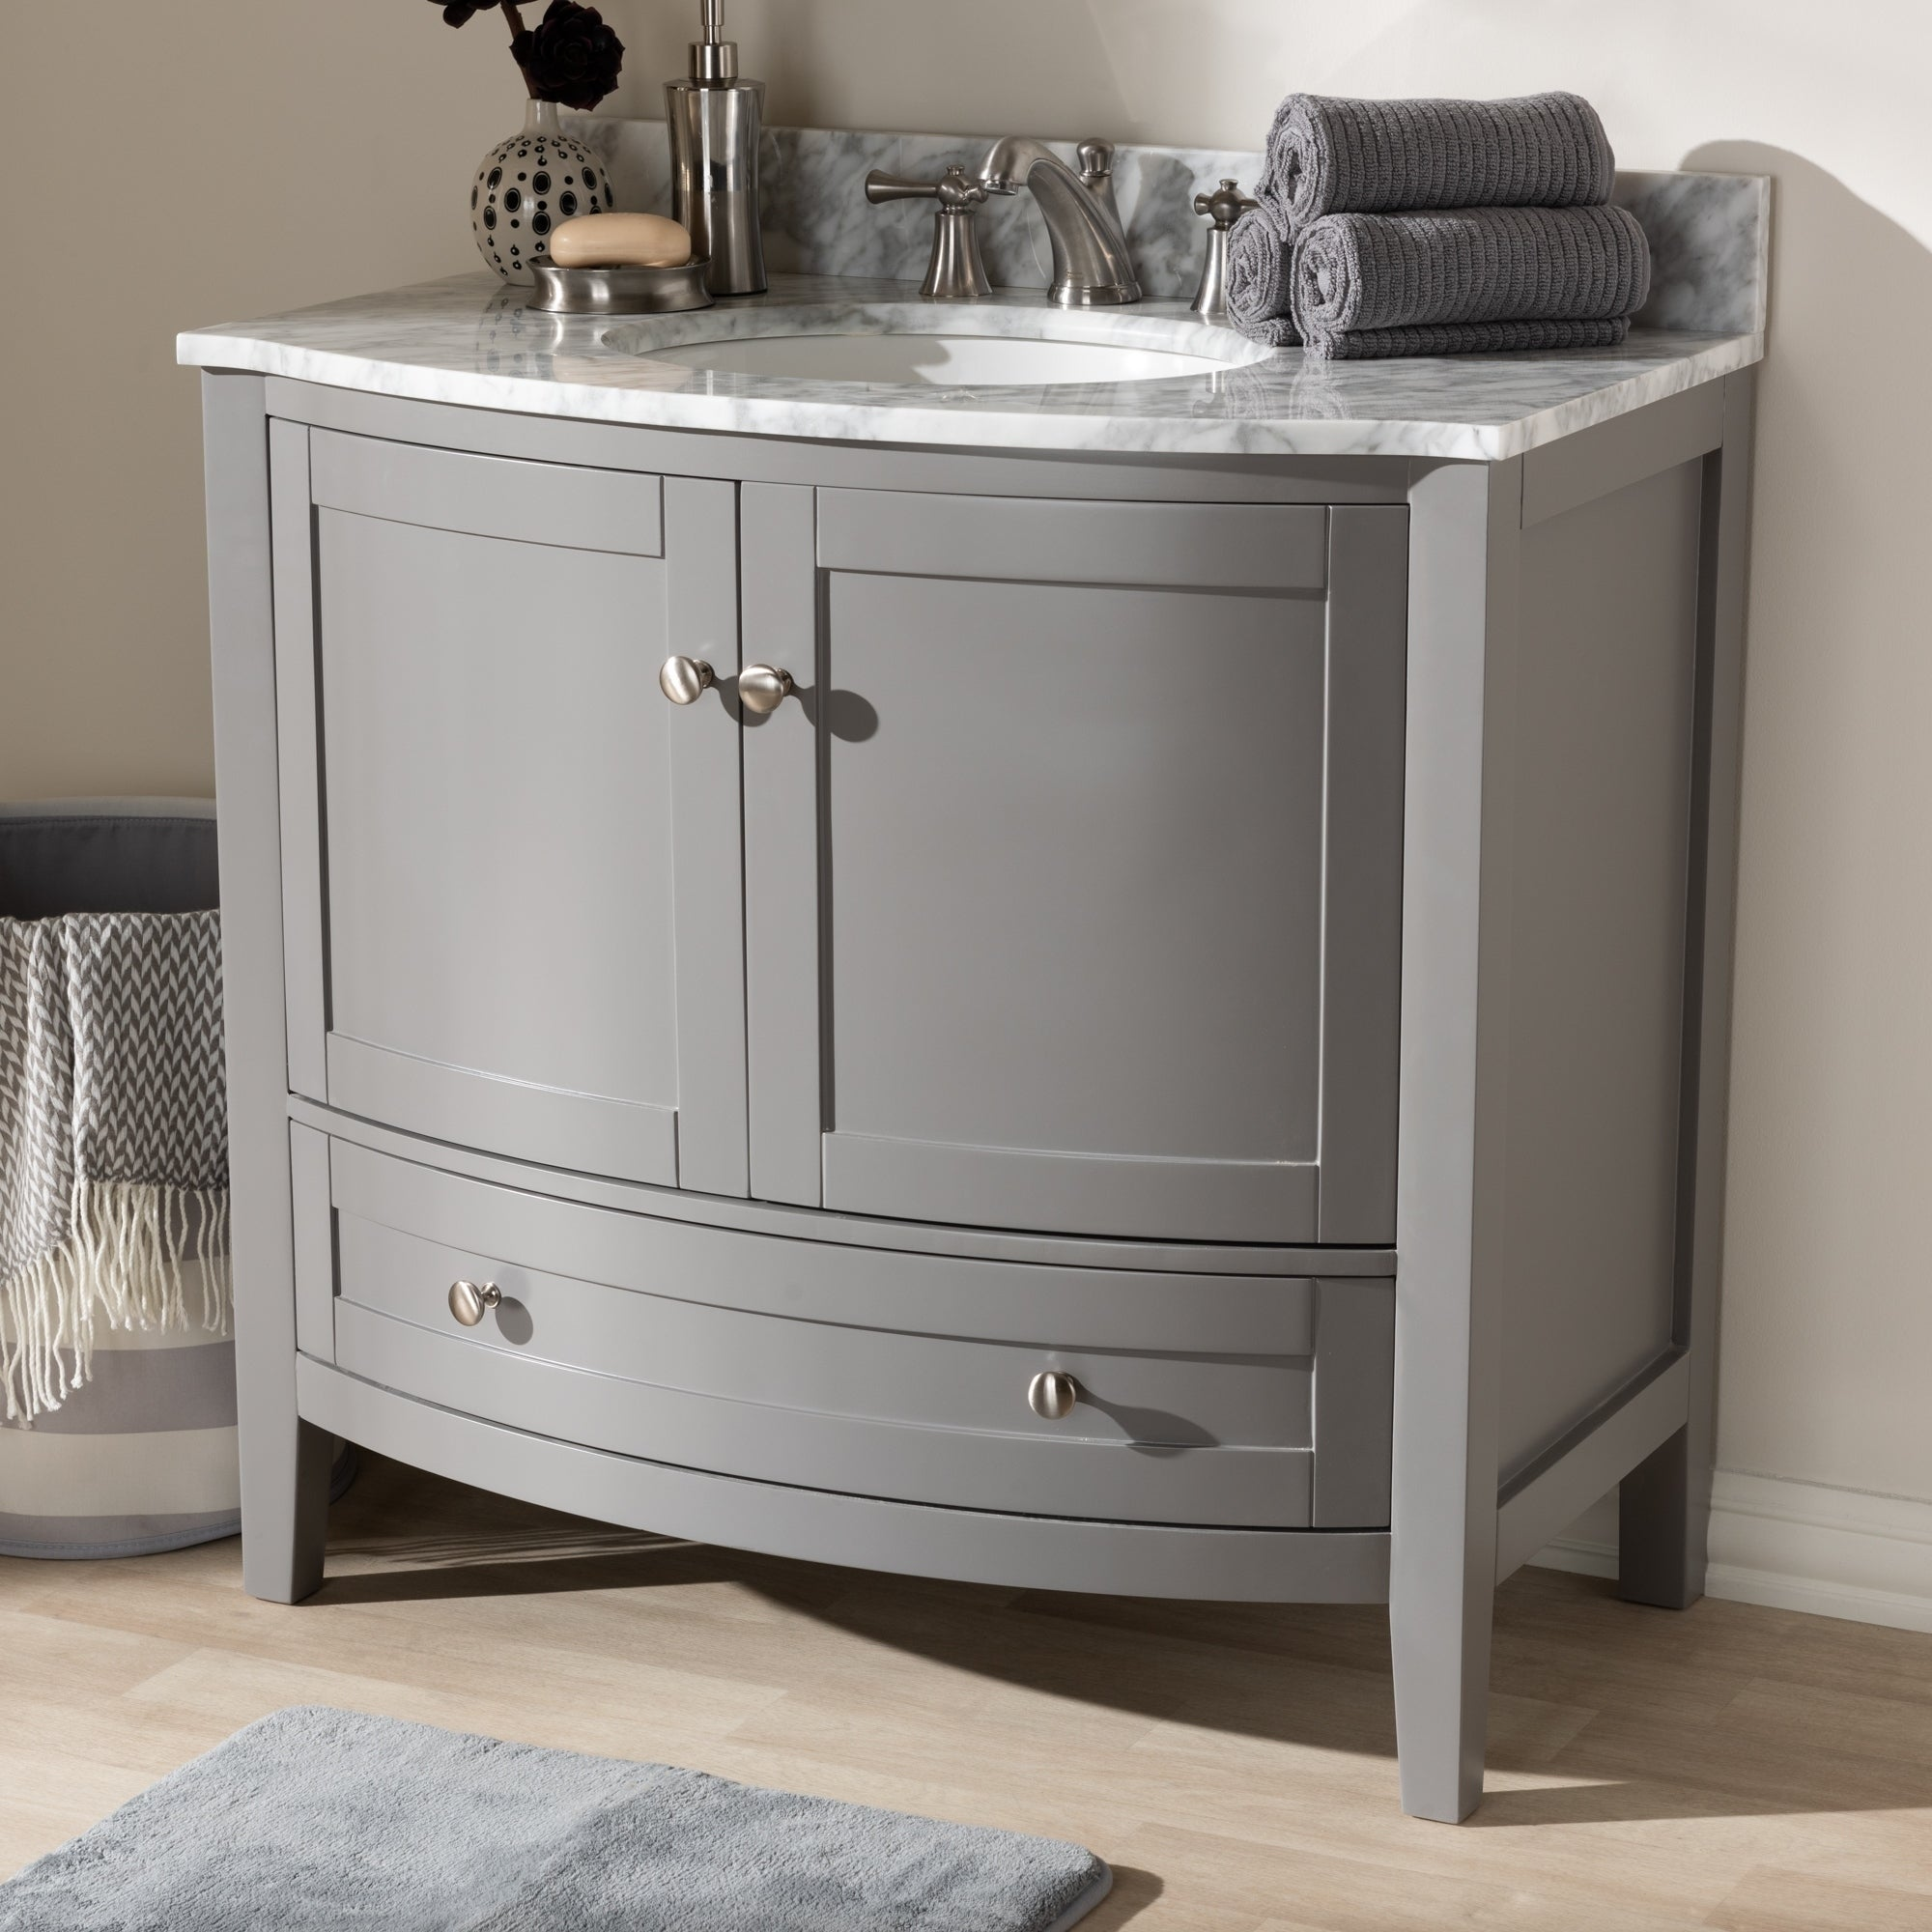 36 Bathroom Vanity   Shop 36 Inch Single Sink Bathroom Vanity By Baxton Studio On Sale